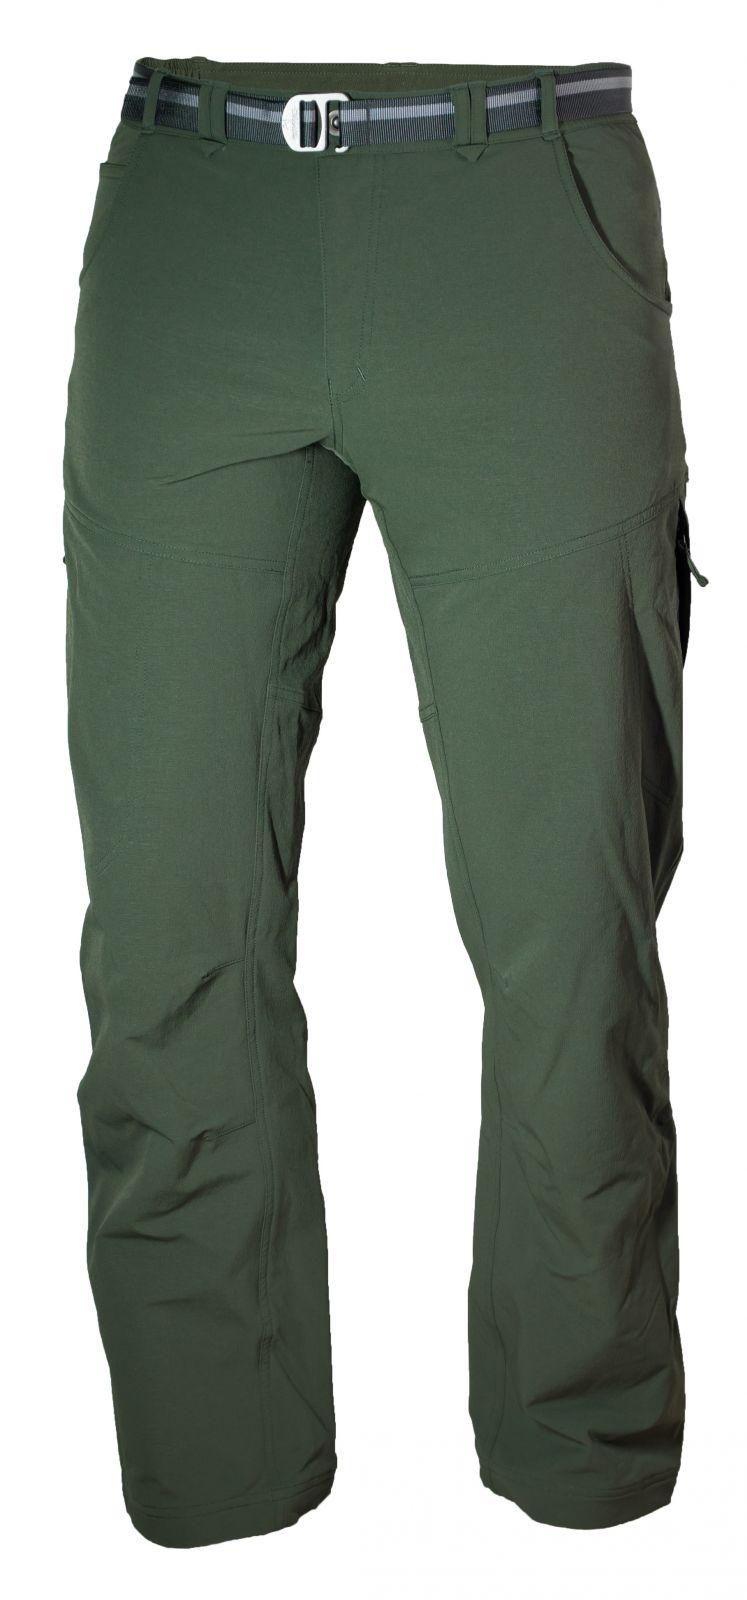 Warmpeace Torg II avocado kalhoty pánské